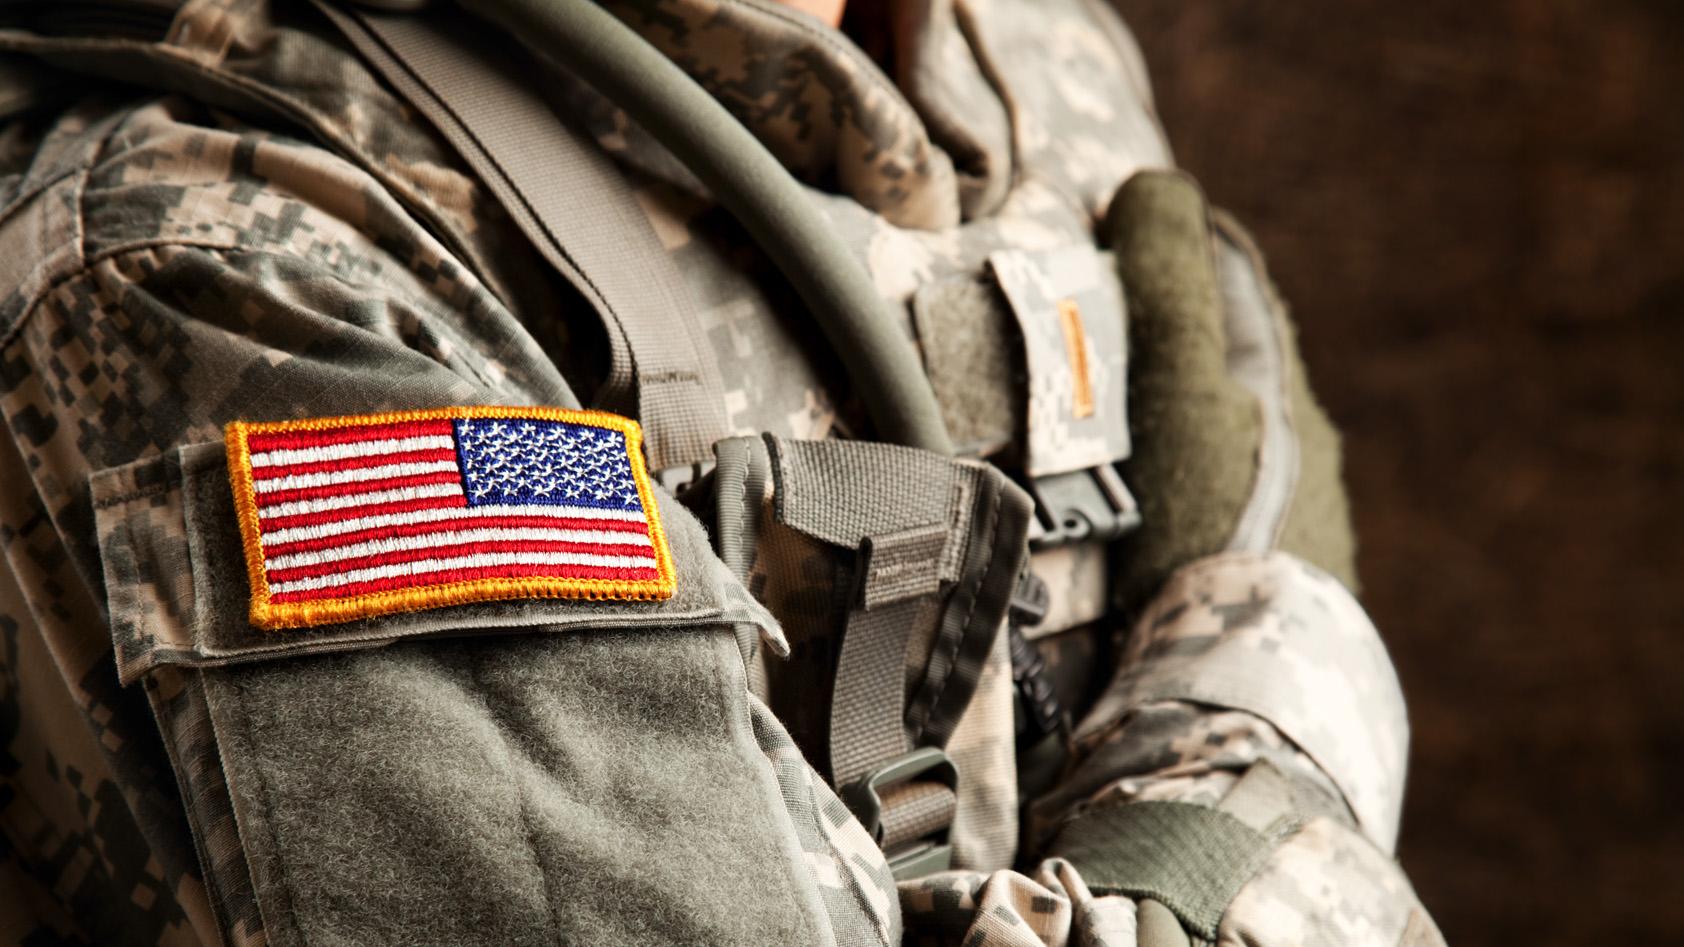 United States serviceman